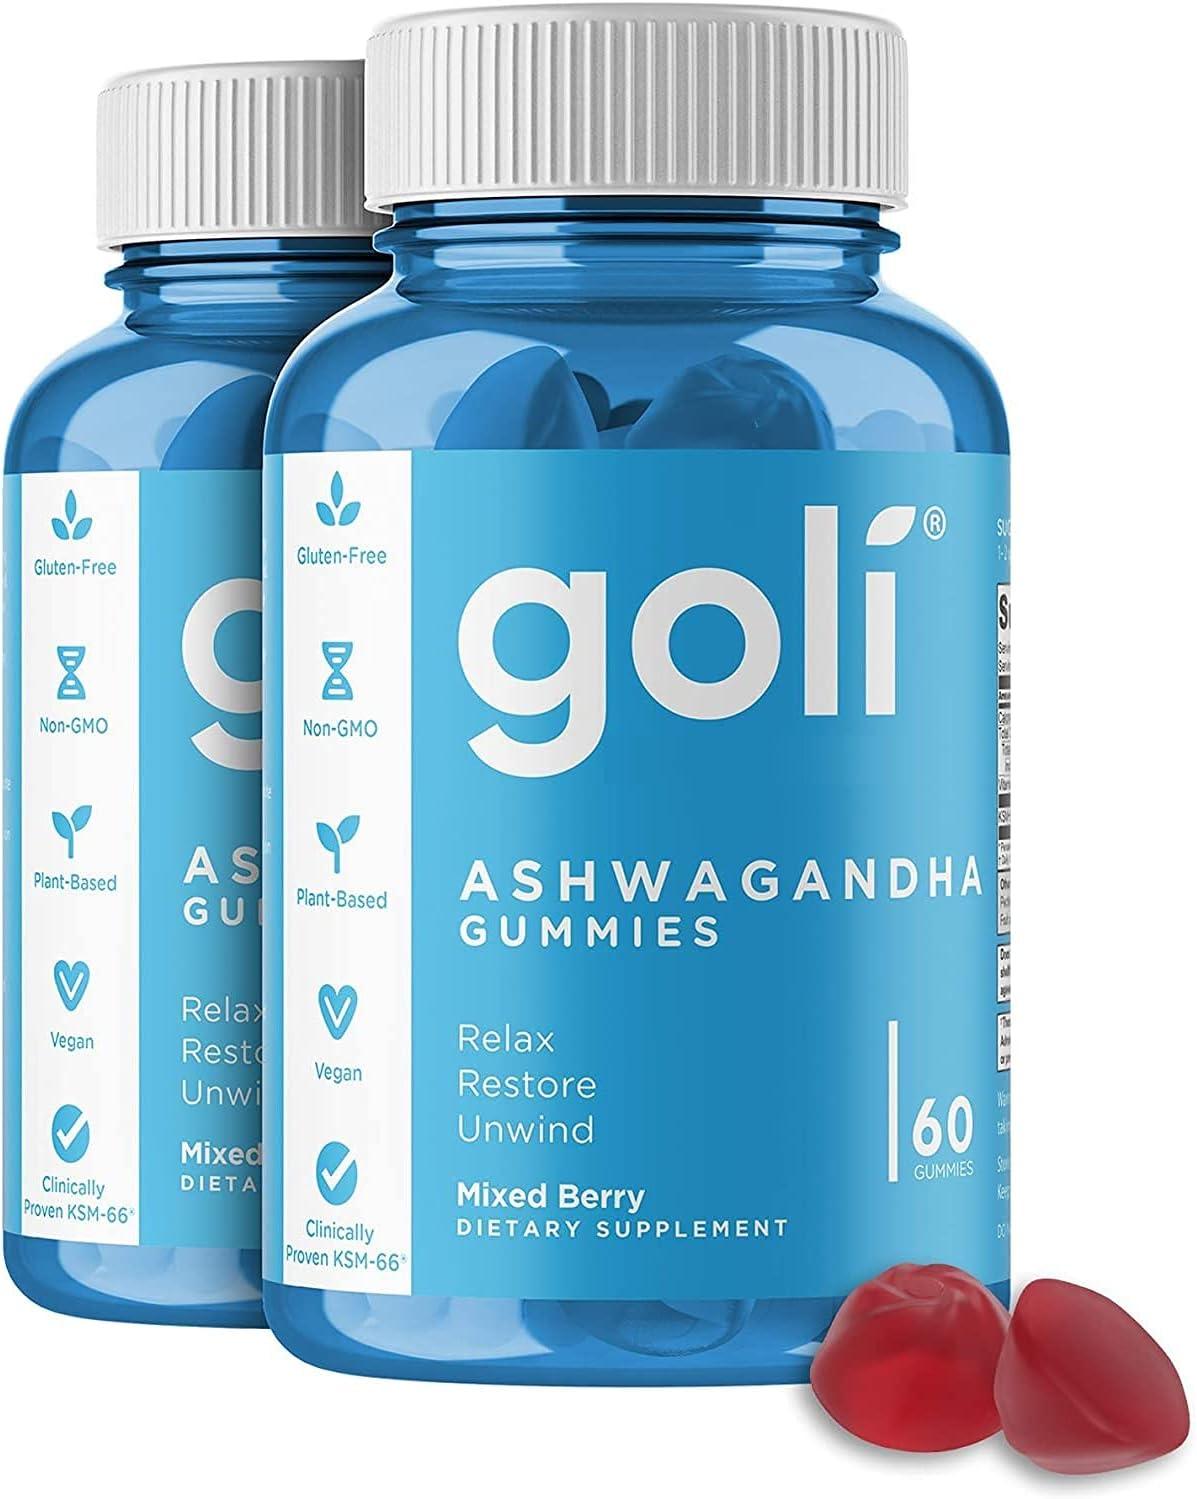 ASHWA Vitamin Gummy by High quality new Goli D Gummies and - Ashwagandha Popular product